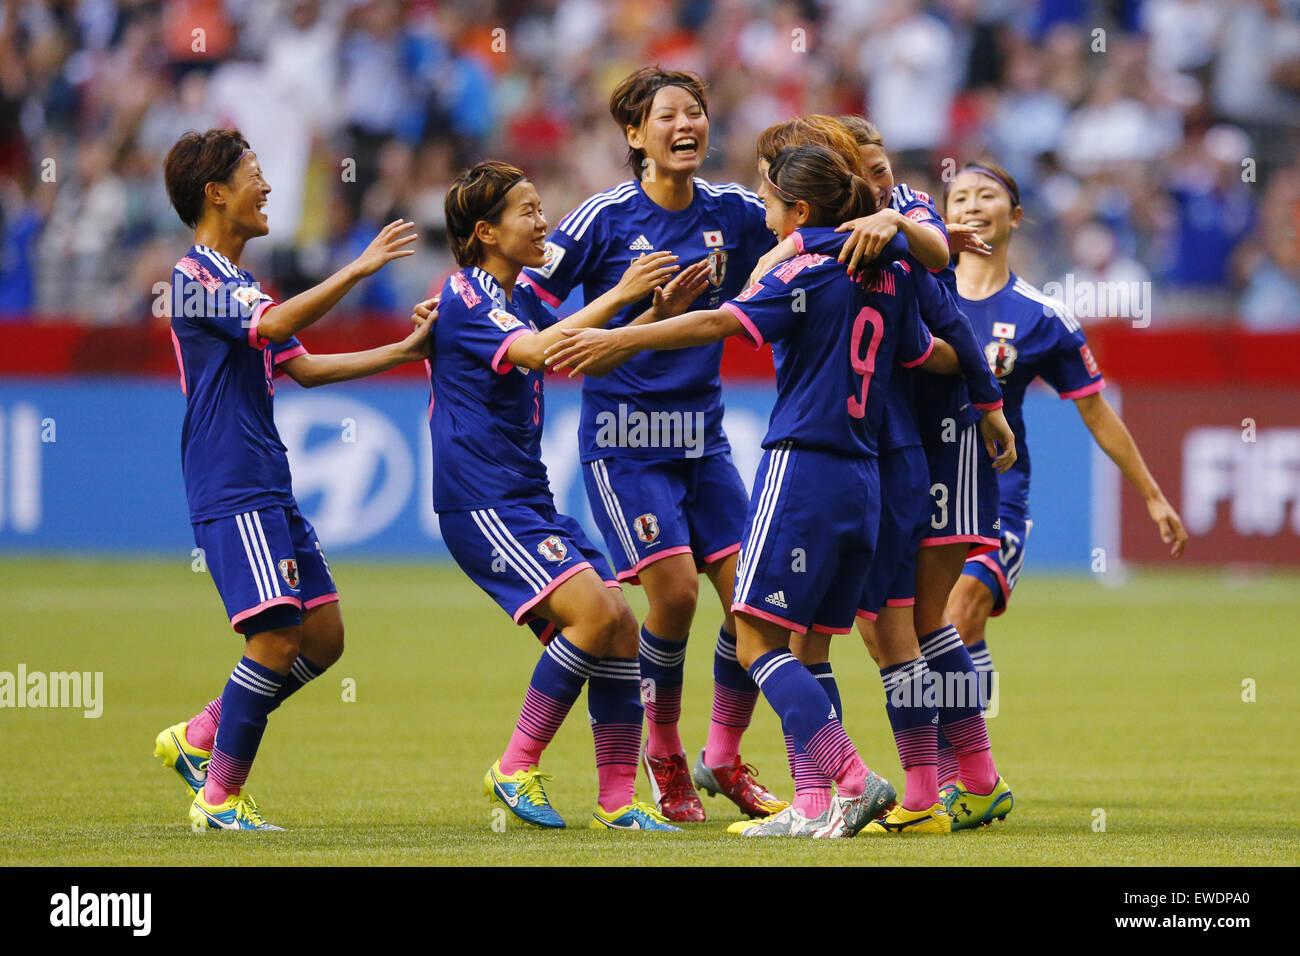 Japan National Team Group Line Up Imágenes De Stock   Japan National ... 0023895c4c102